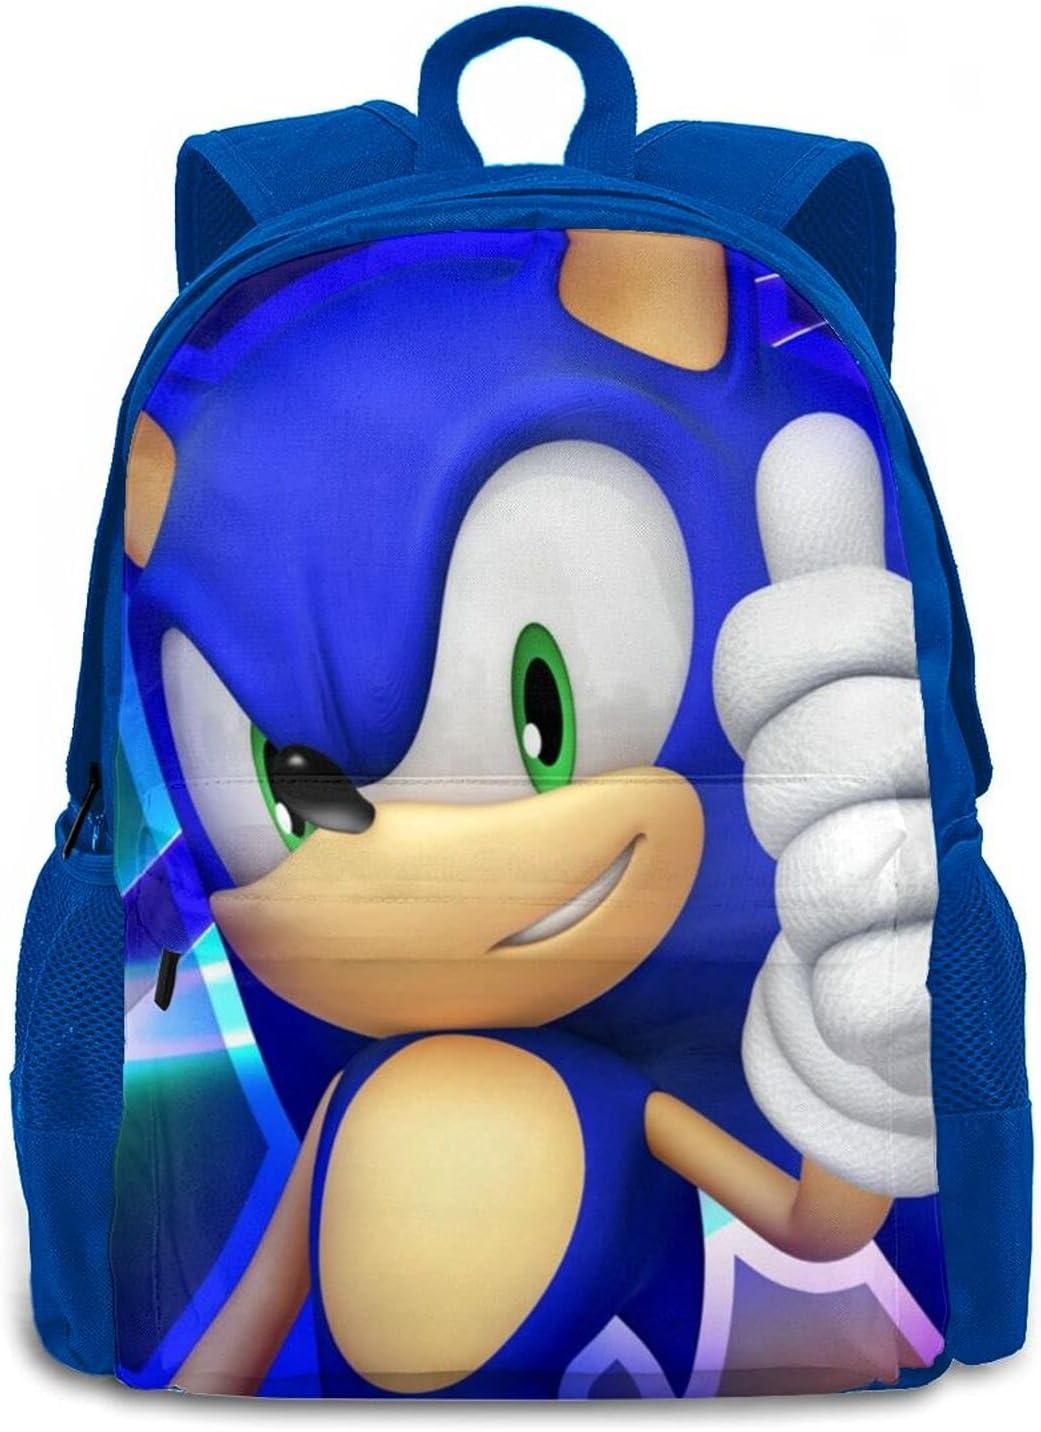 Sōnic Backpack - Boys Backpacks Cartoon Ba Store Kids School Recommended